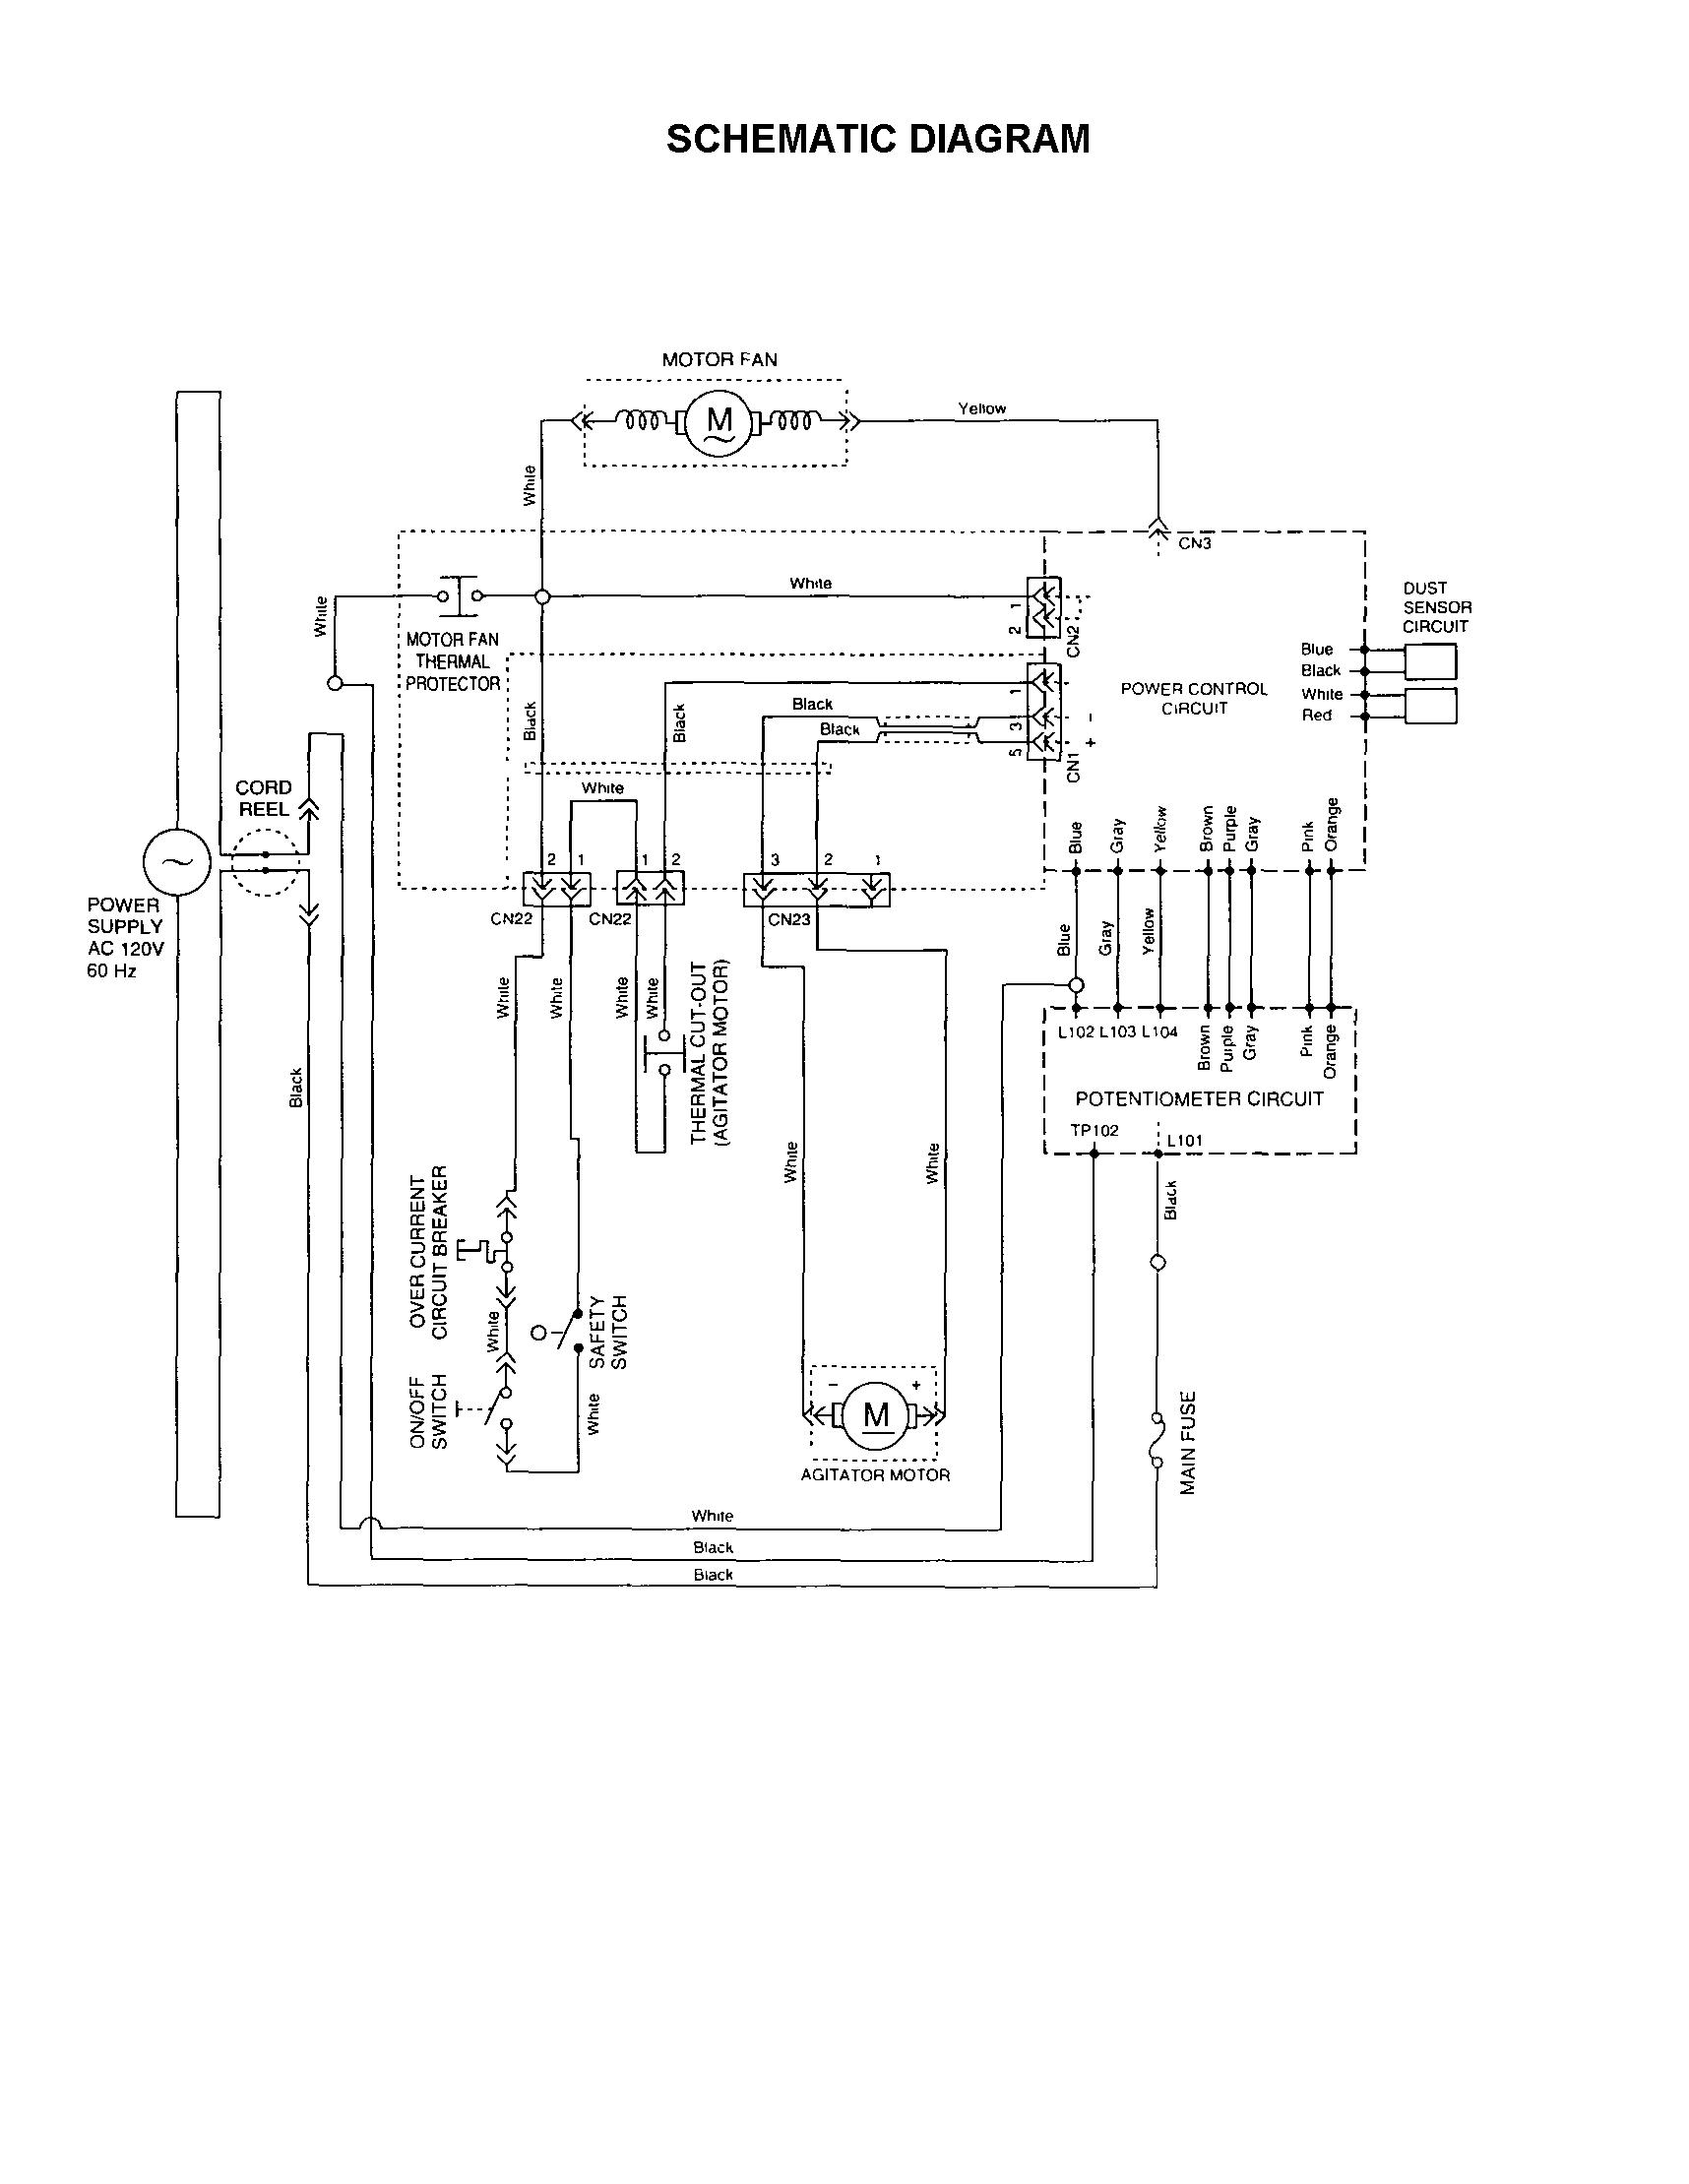 Panasonic model MC-E583 vacuum, upright genuine parts